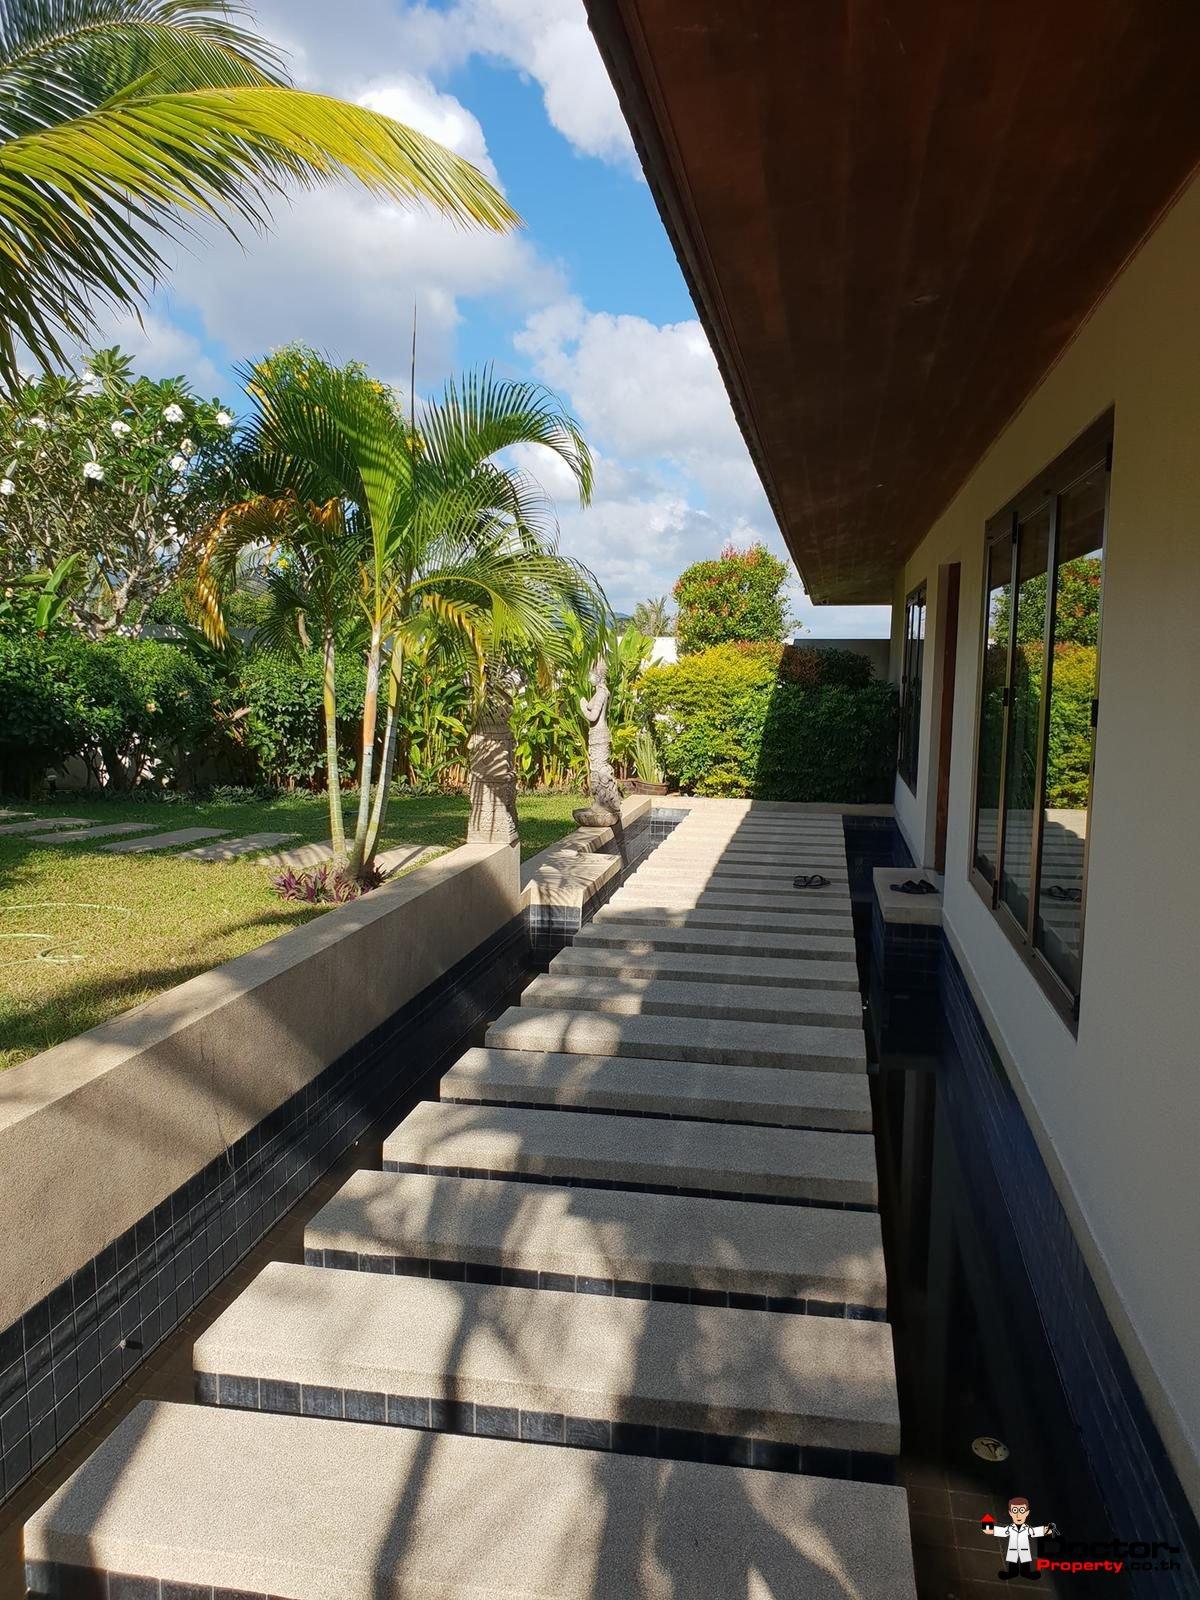 6 Bedroom Villa with Sea View - Bophut - Koh Samui - for sale 10